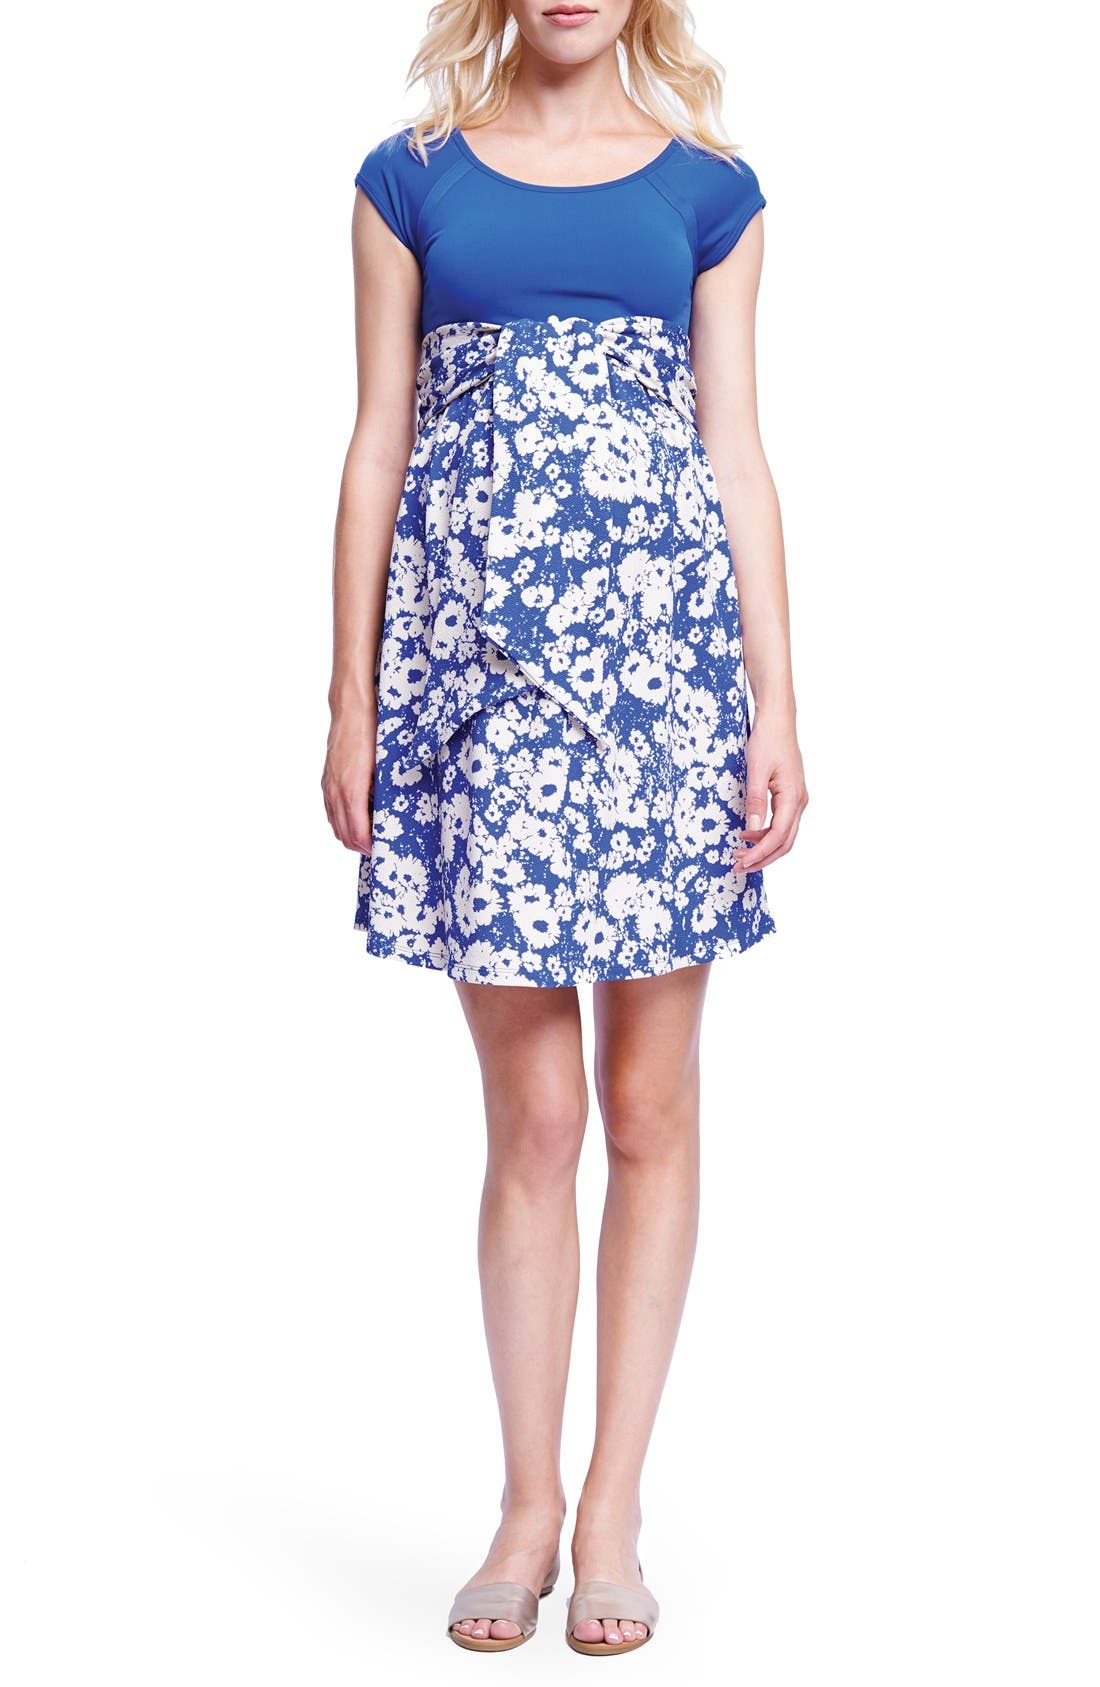 Tie Front Maternity Dress,                             Main thumbnail 1, color,                             ROYAL BLUE/ ABSTRACT DAISY